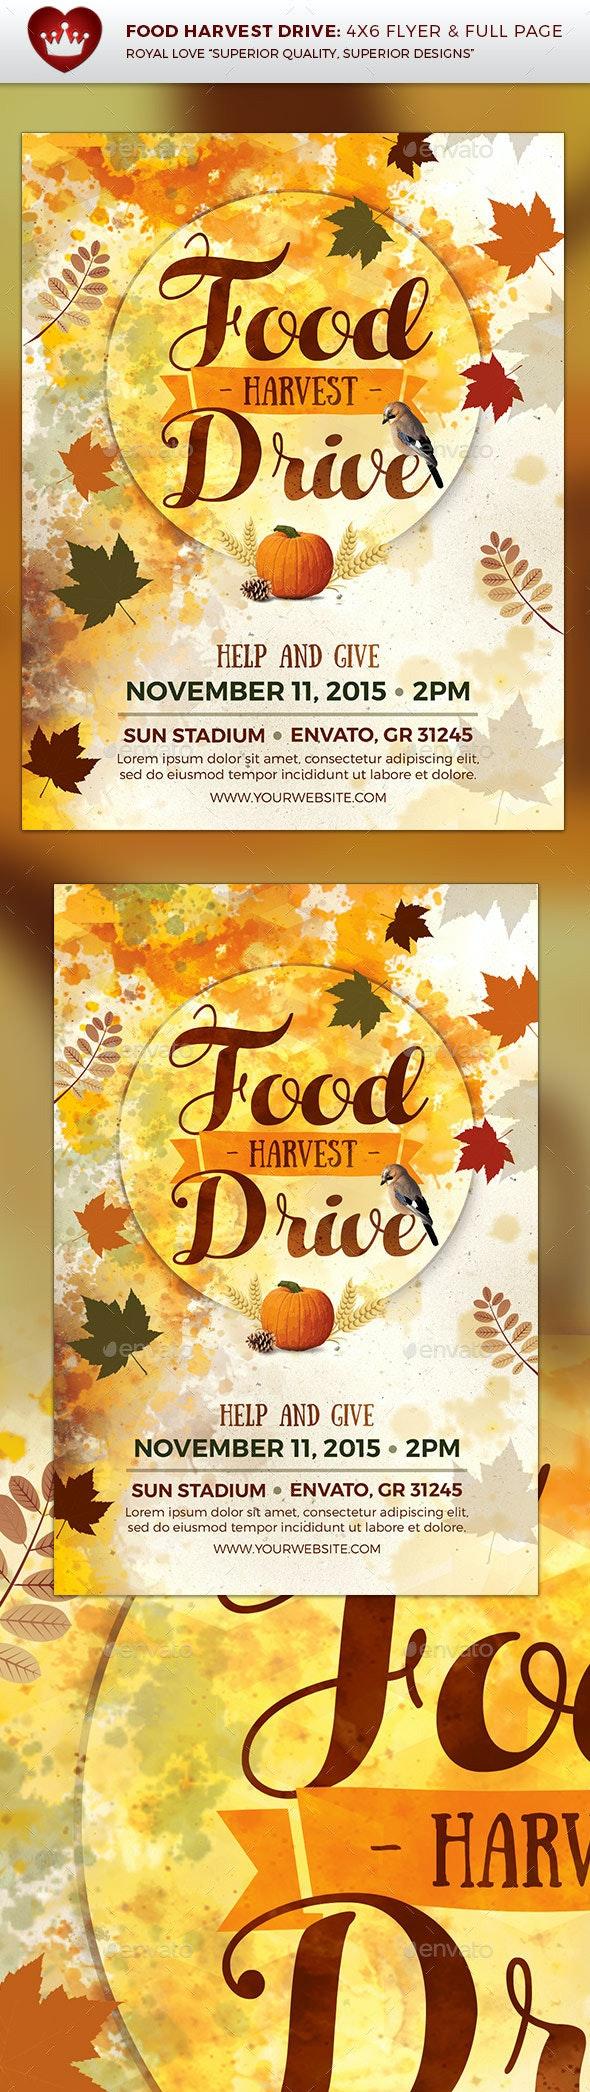 Food Harvest Drive Flyer - Flyers Print Templates